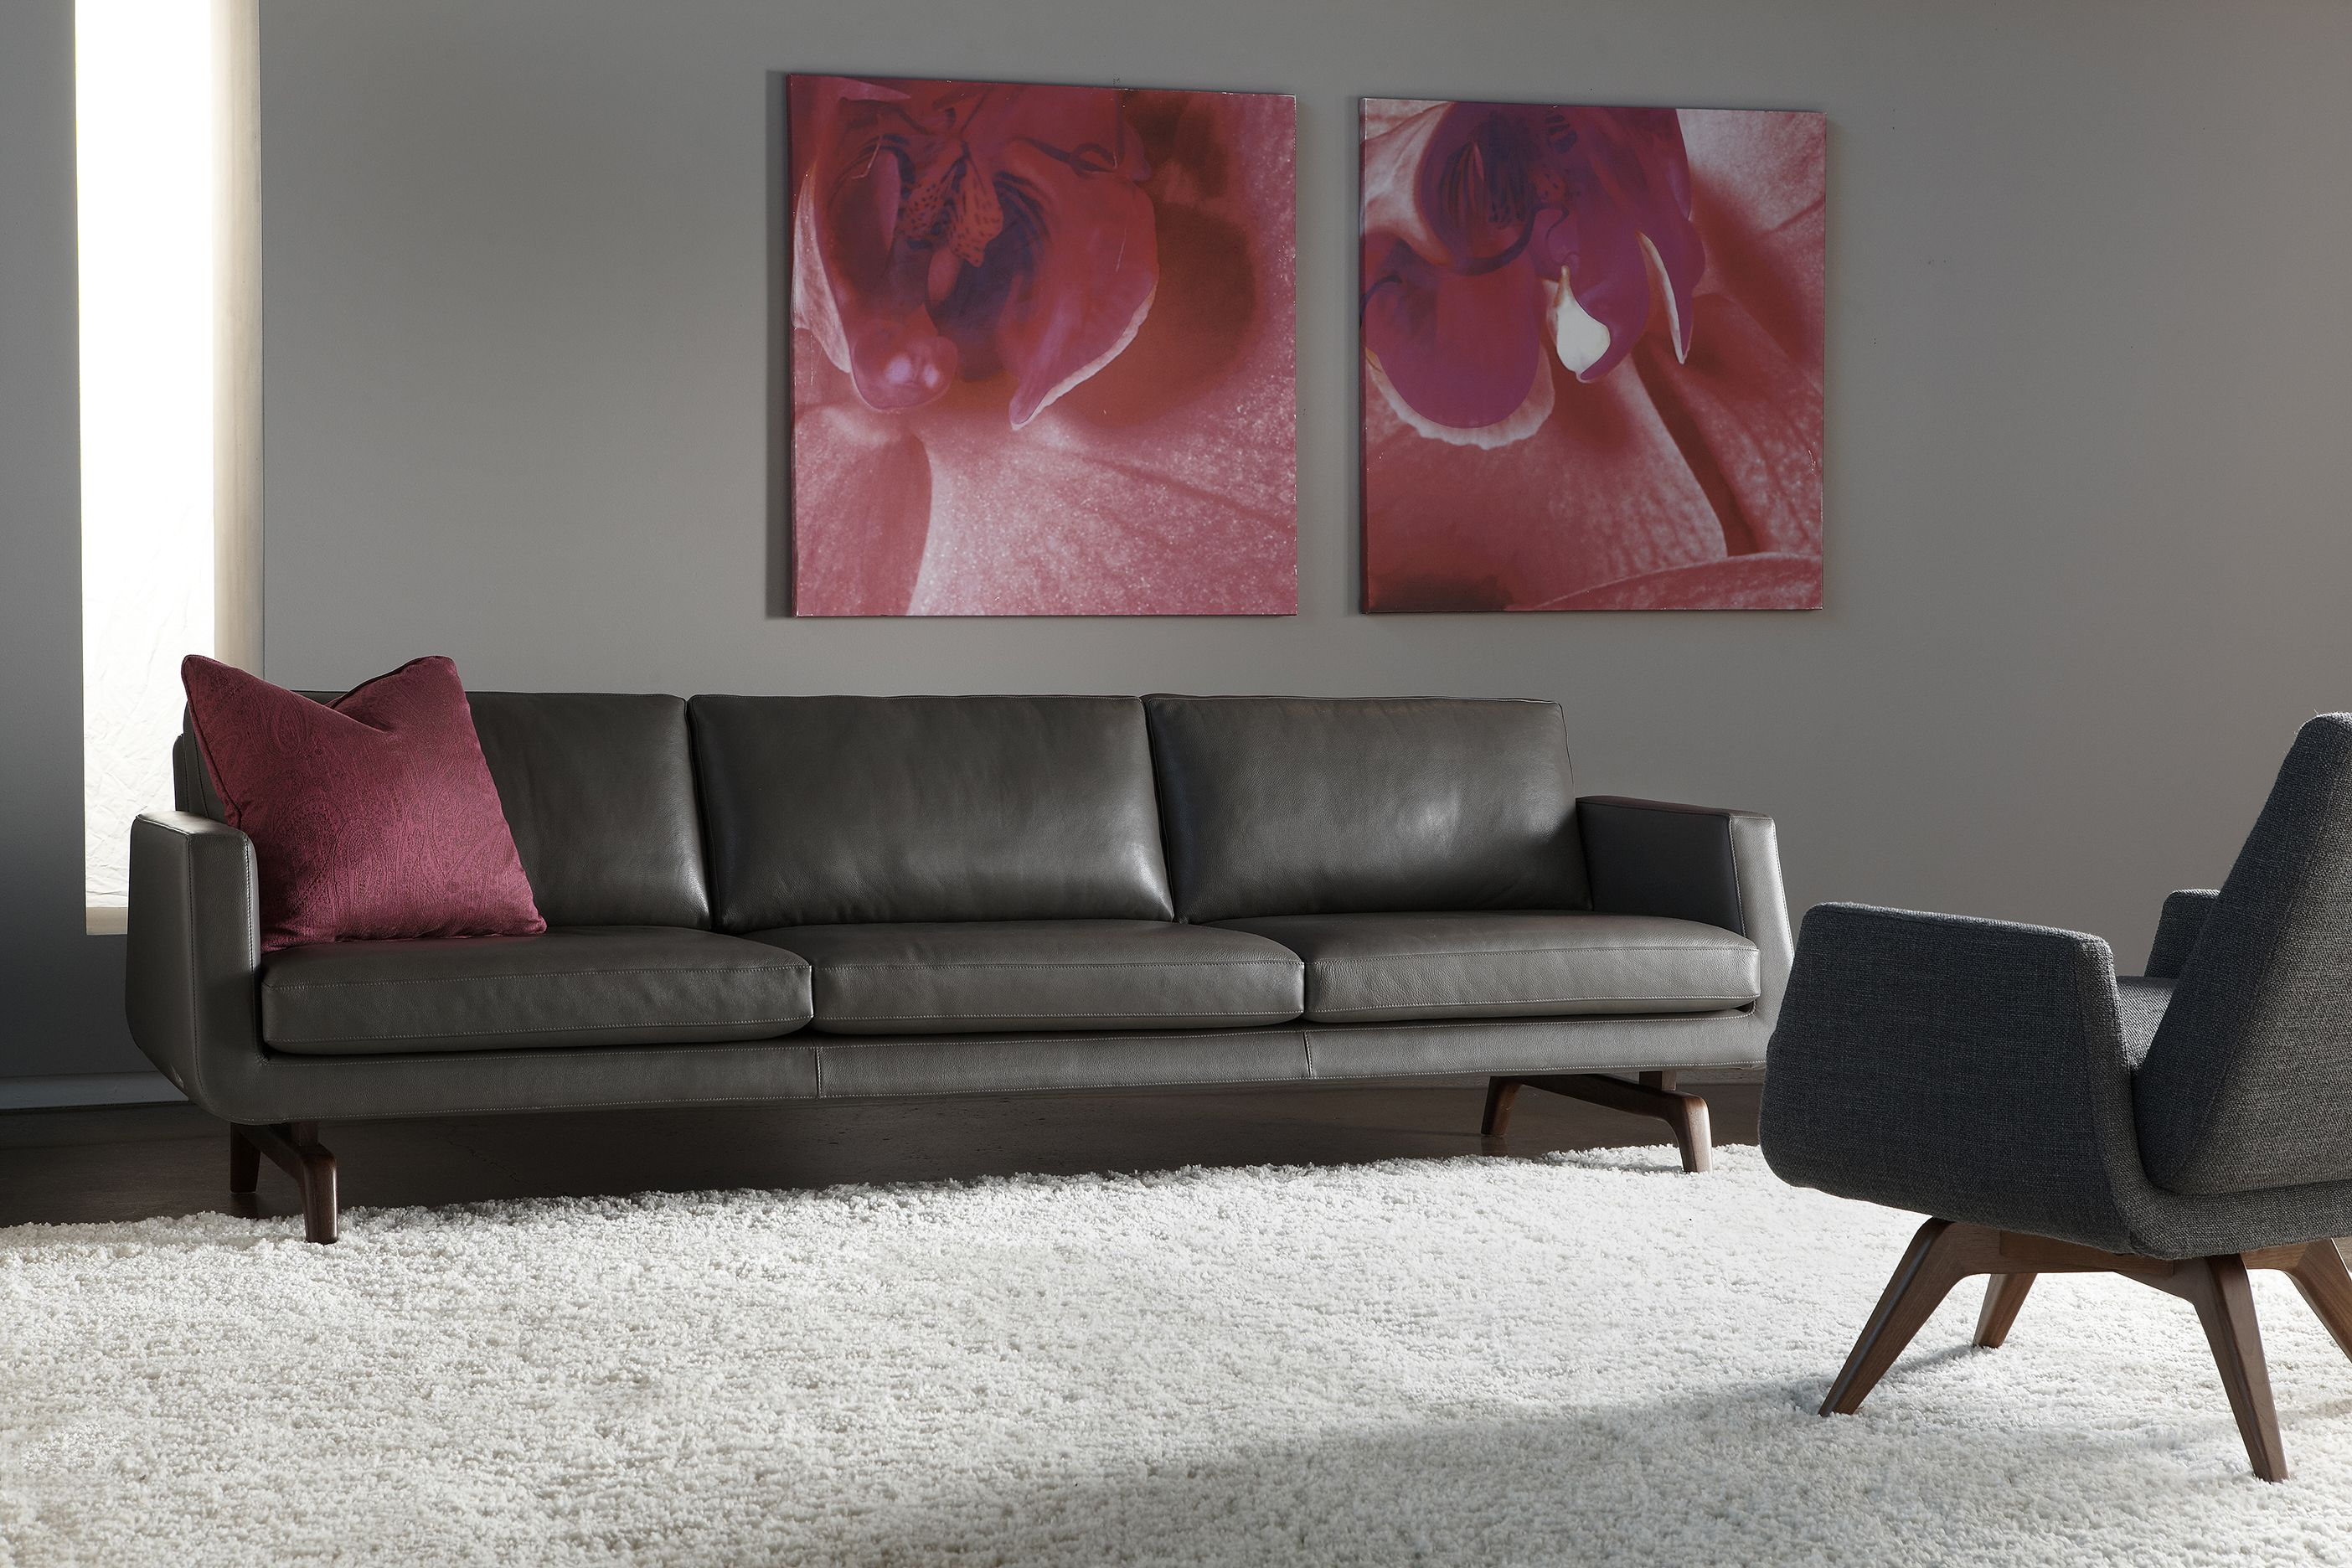 Superb Cool American Leather Sleeper Sofa Reviews , Lovely American Leather  Sleeper Sofa Reviews 11 In Sofa Design Ideas With American Leather Sleeper Sofa  Reviews ...